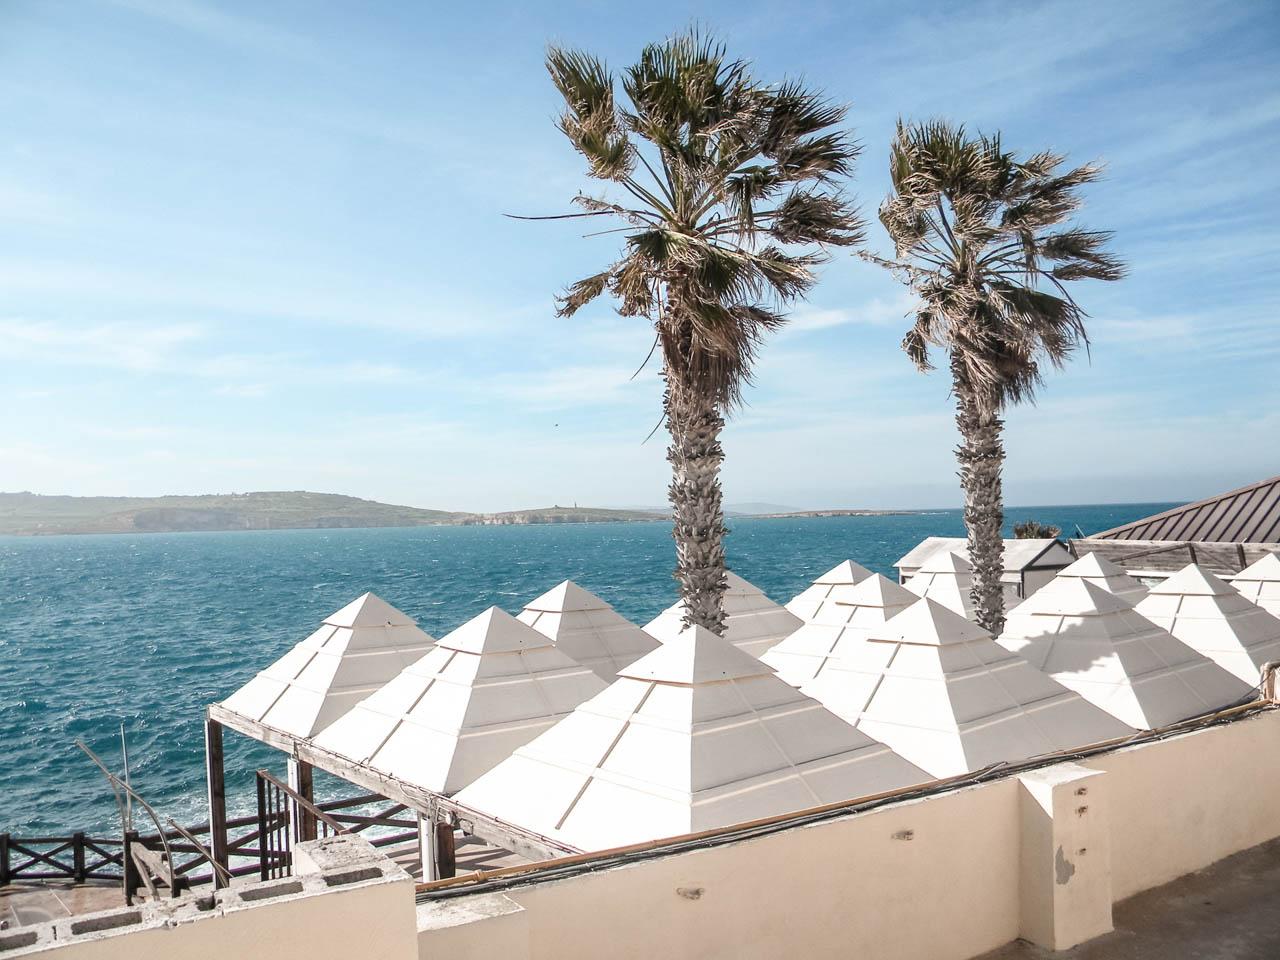 Palm trees on a beach in Bugibba, Malta